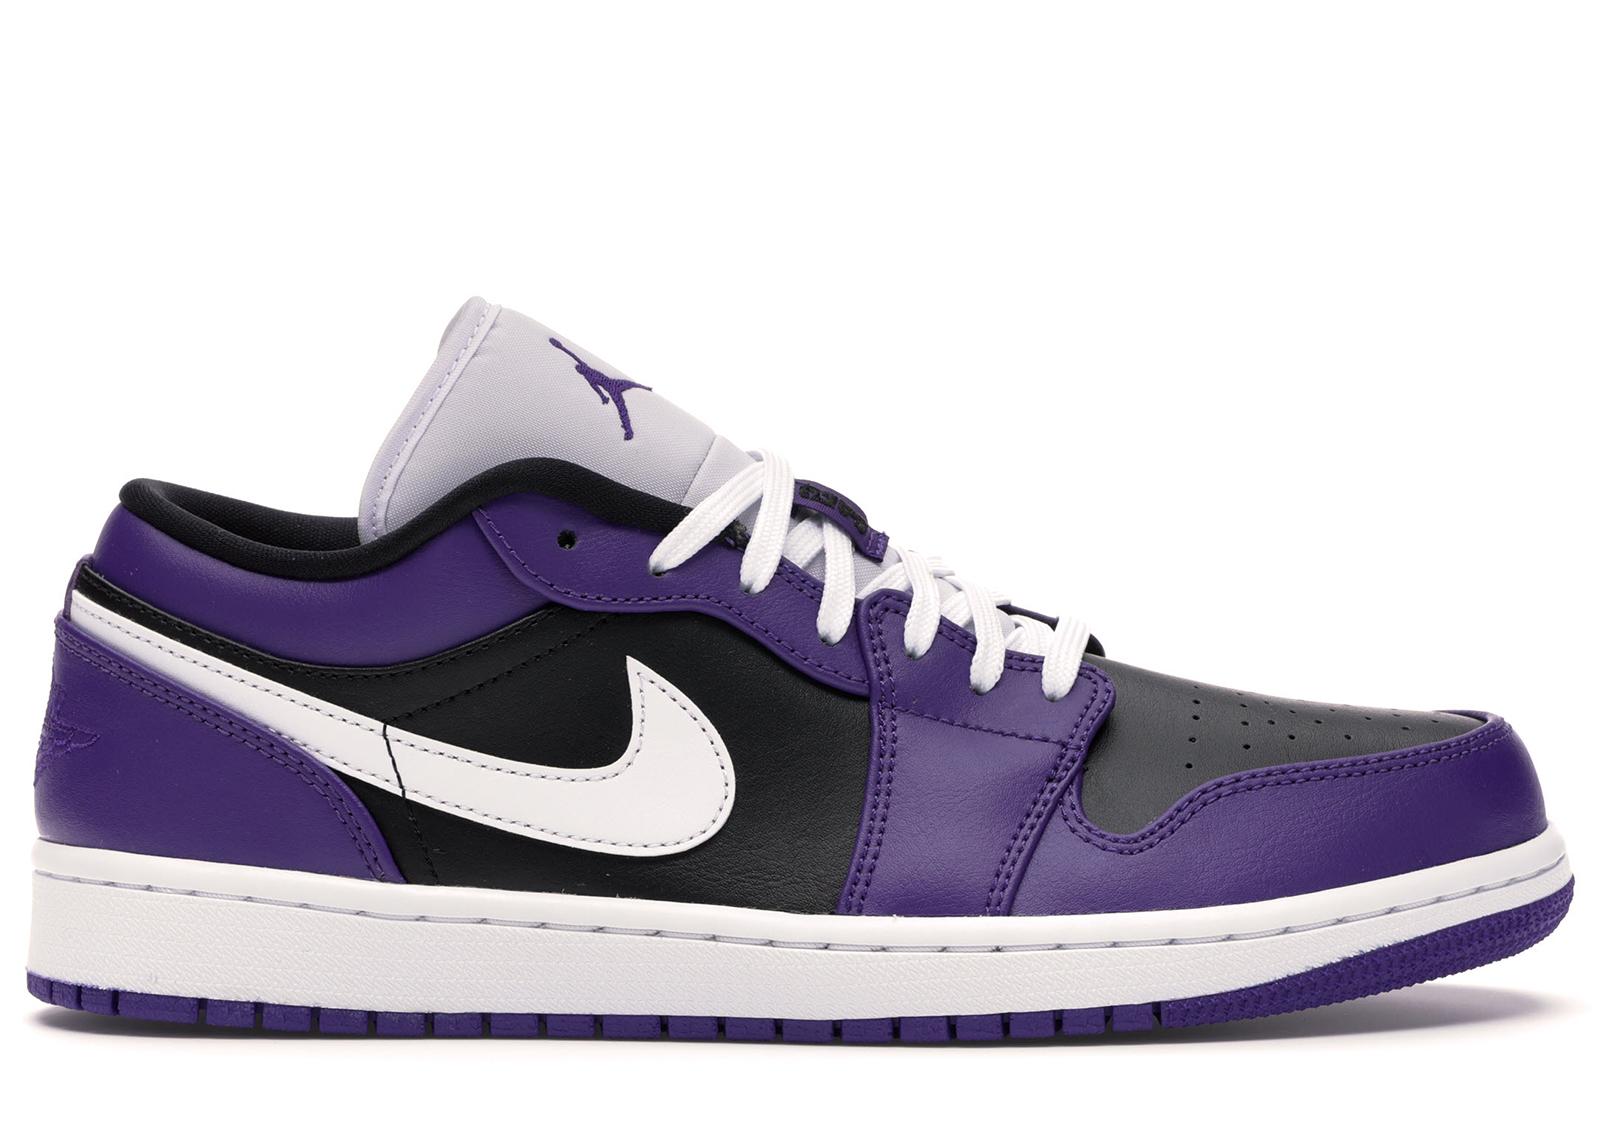 Jordan 1 Low Court Purple Black